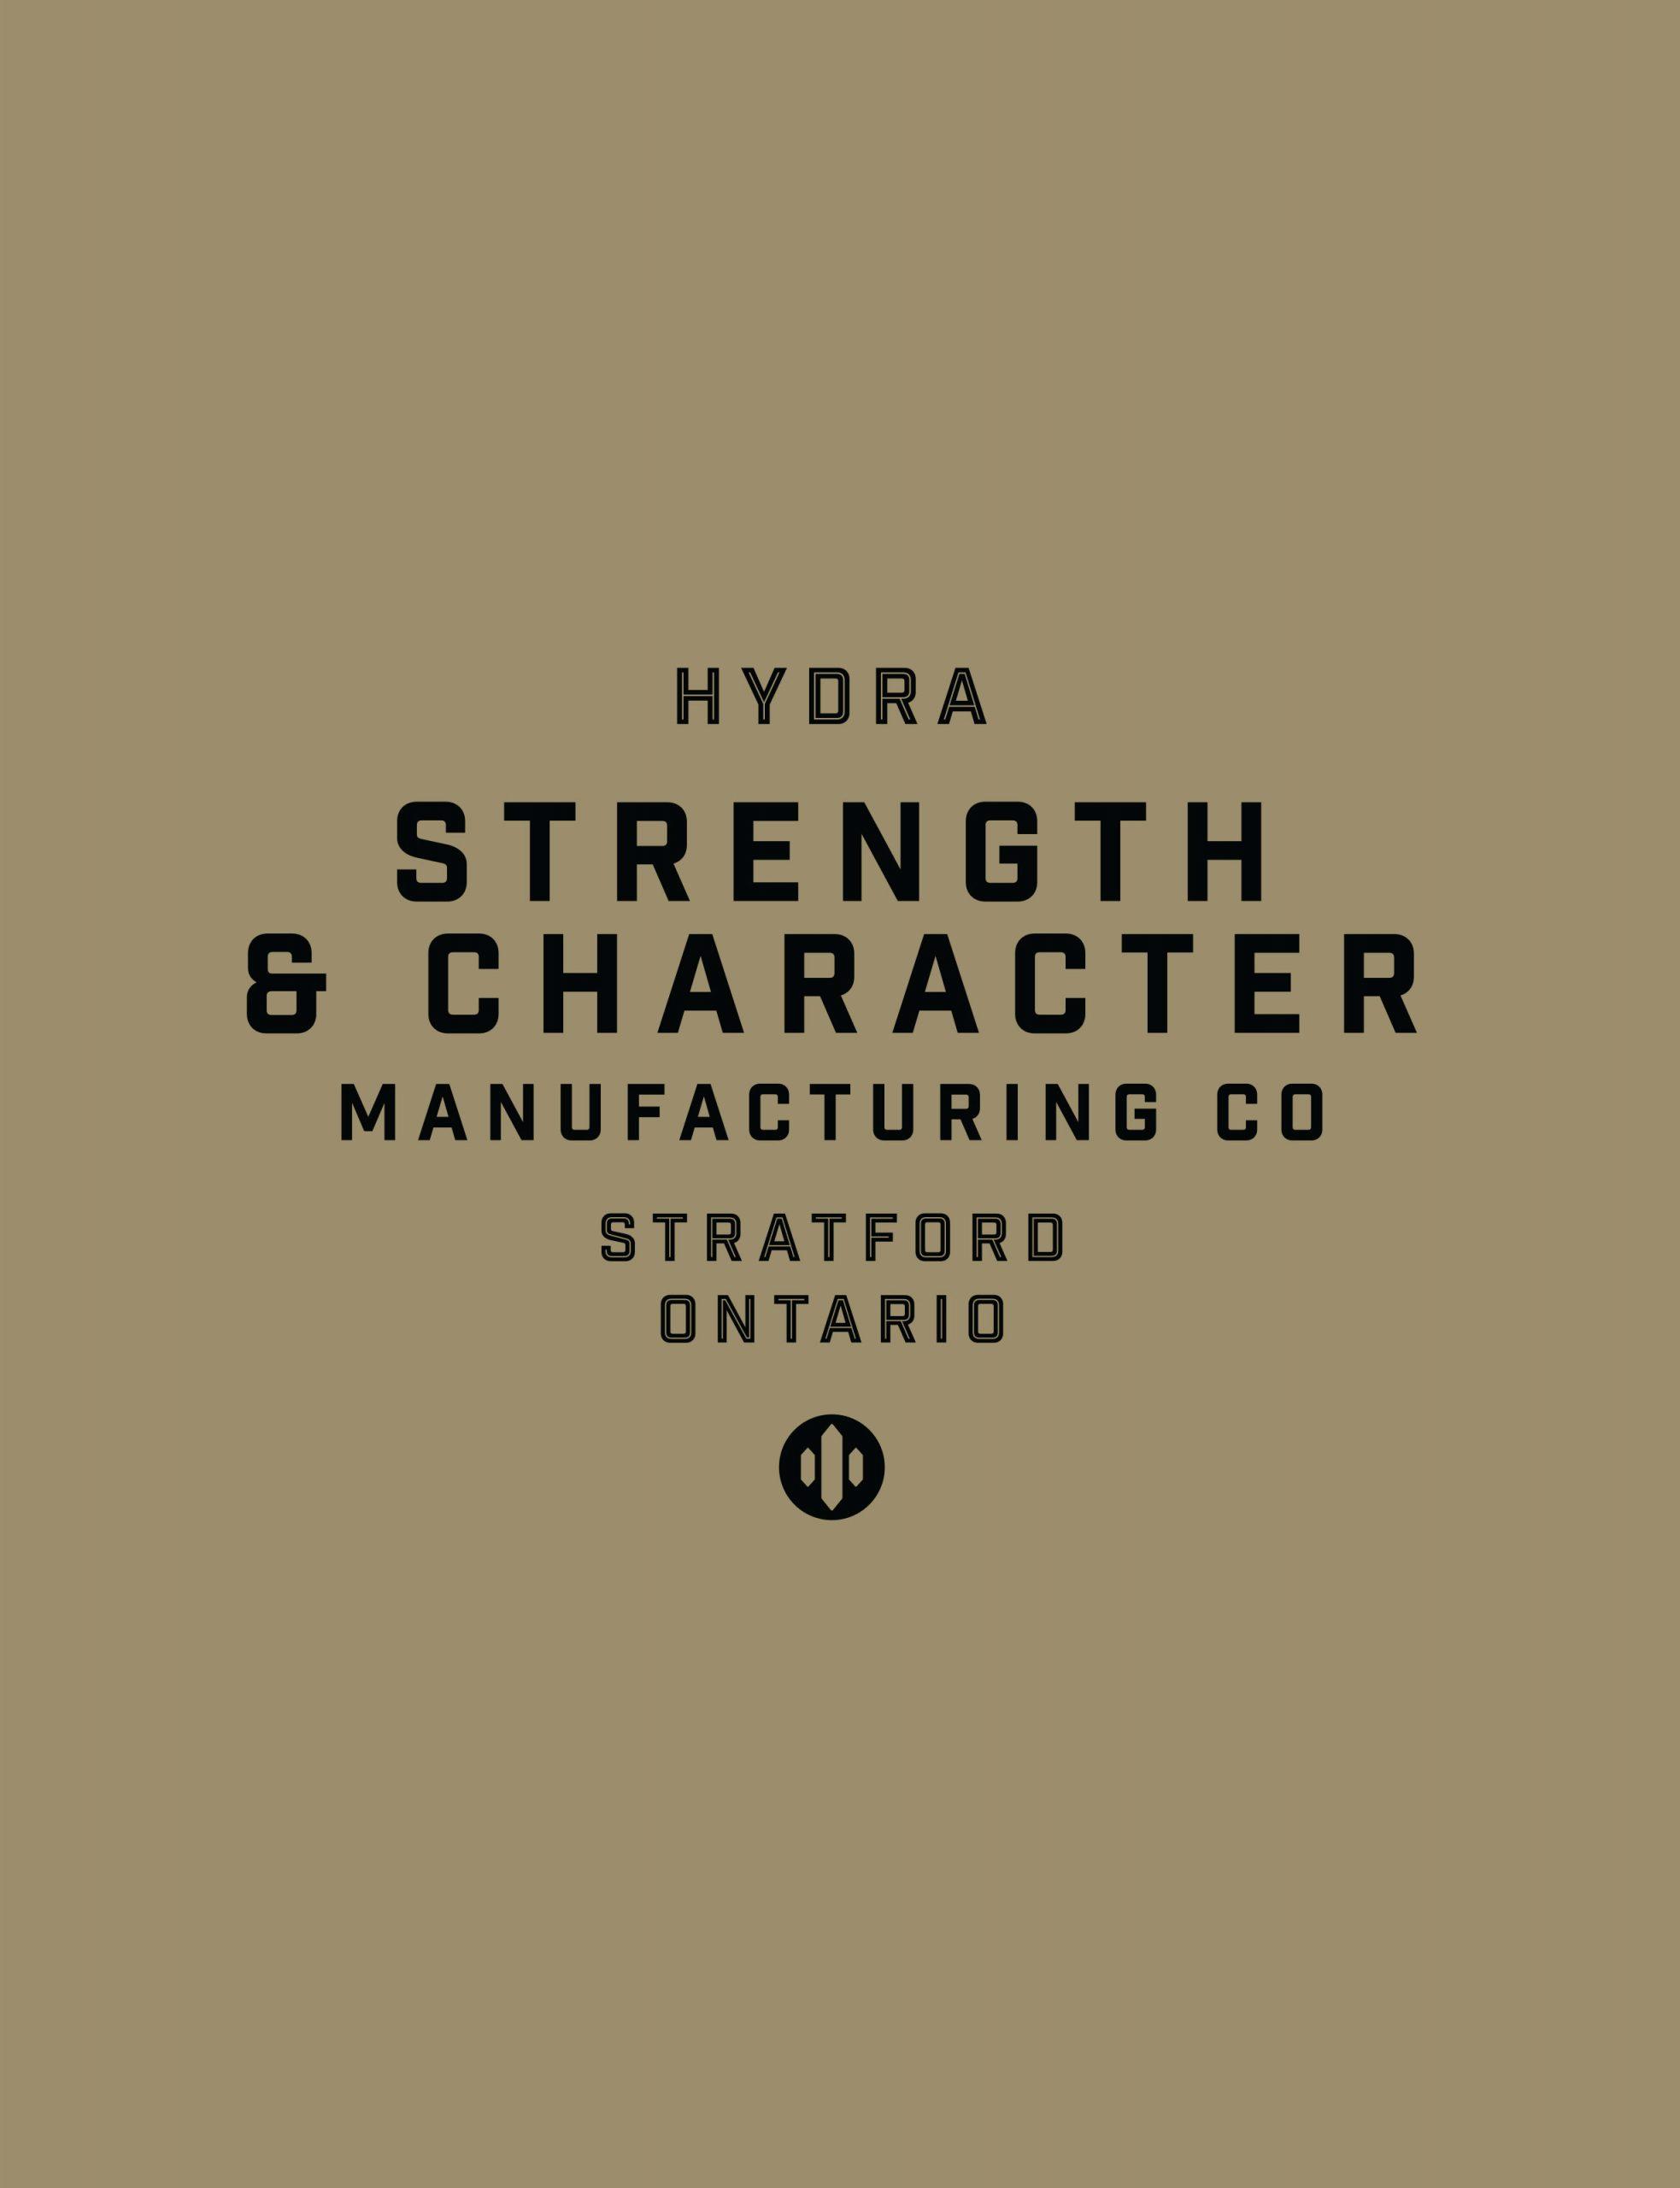 Hydra-Branding_Portfolio_Portrait_04